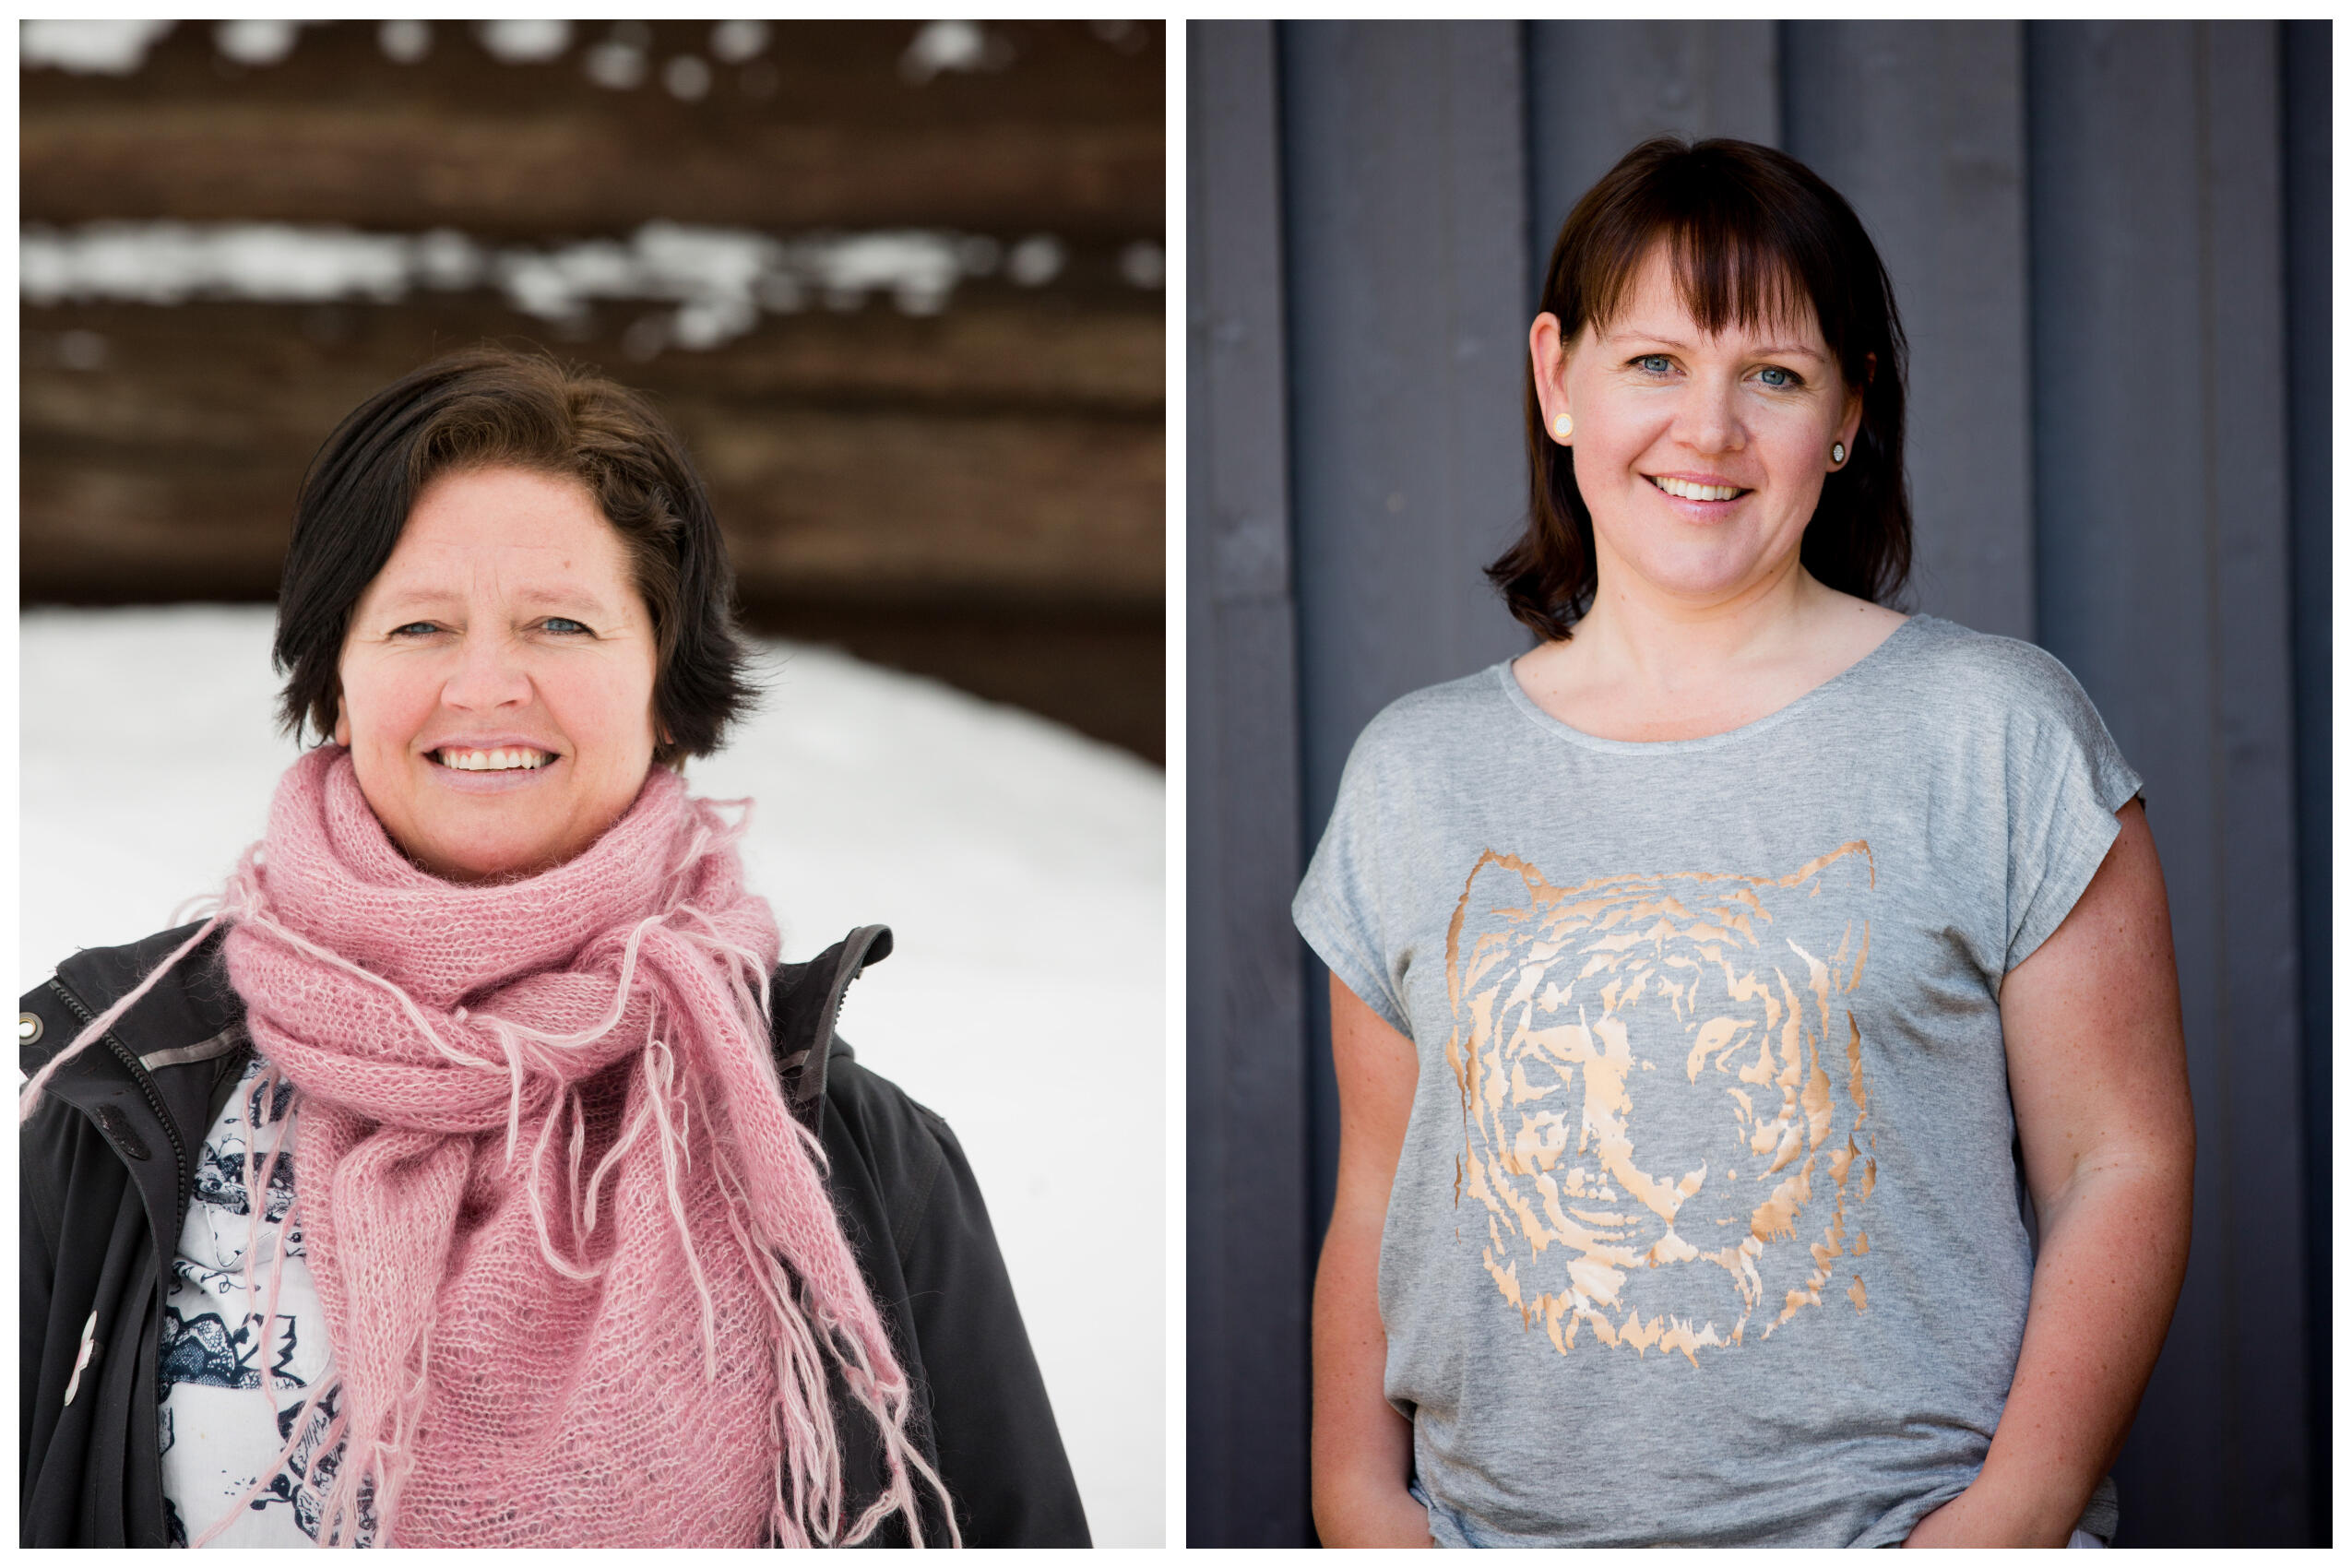 Anita Holmestad og Hilde Andresen Aarhus